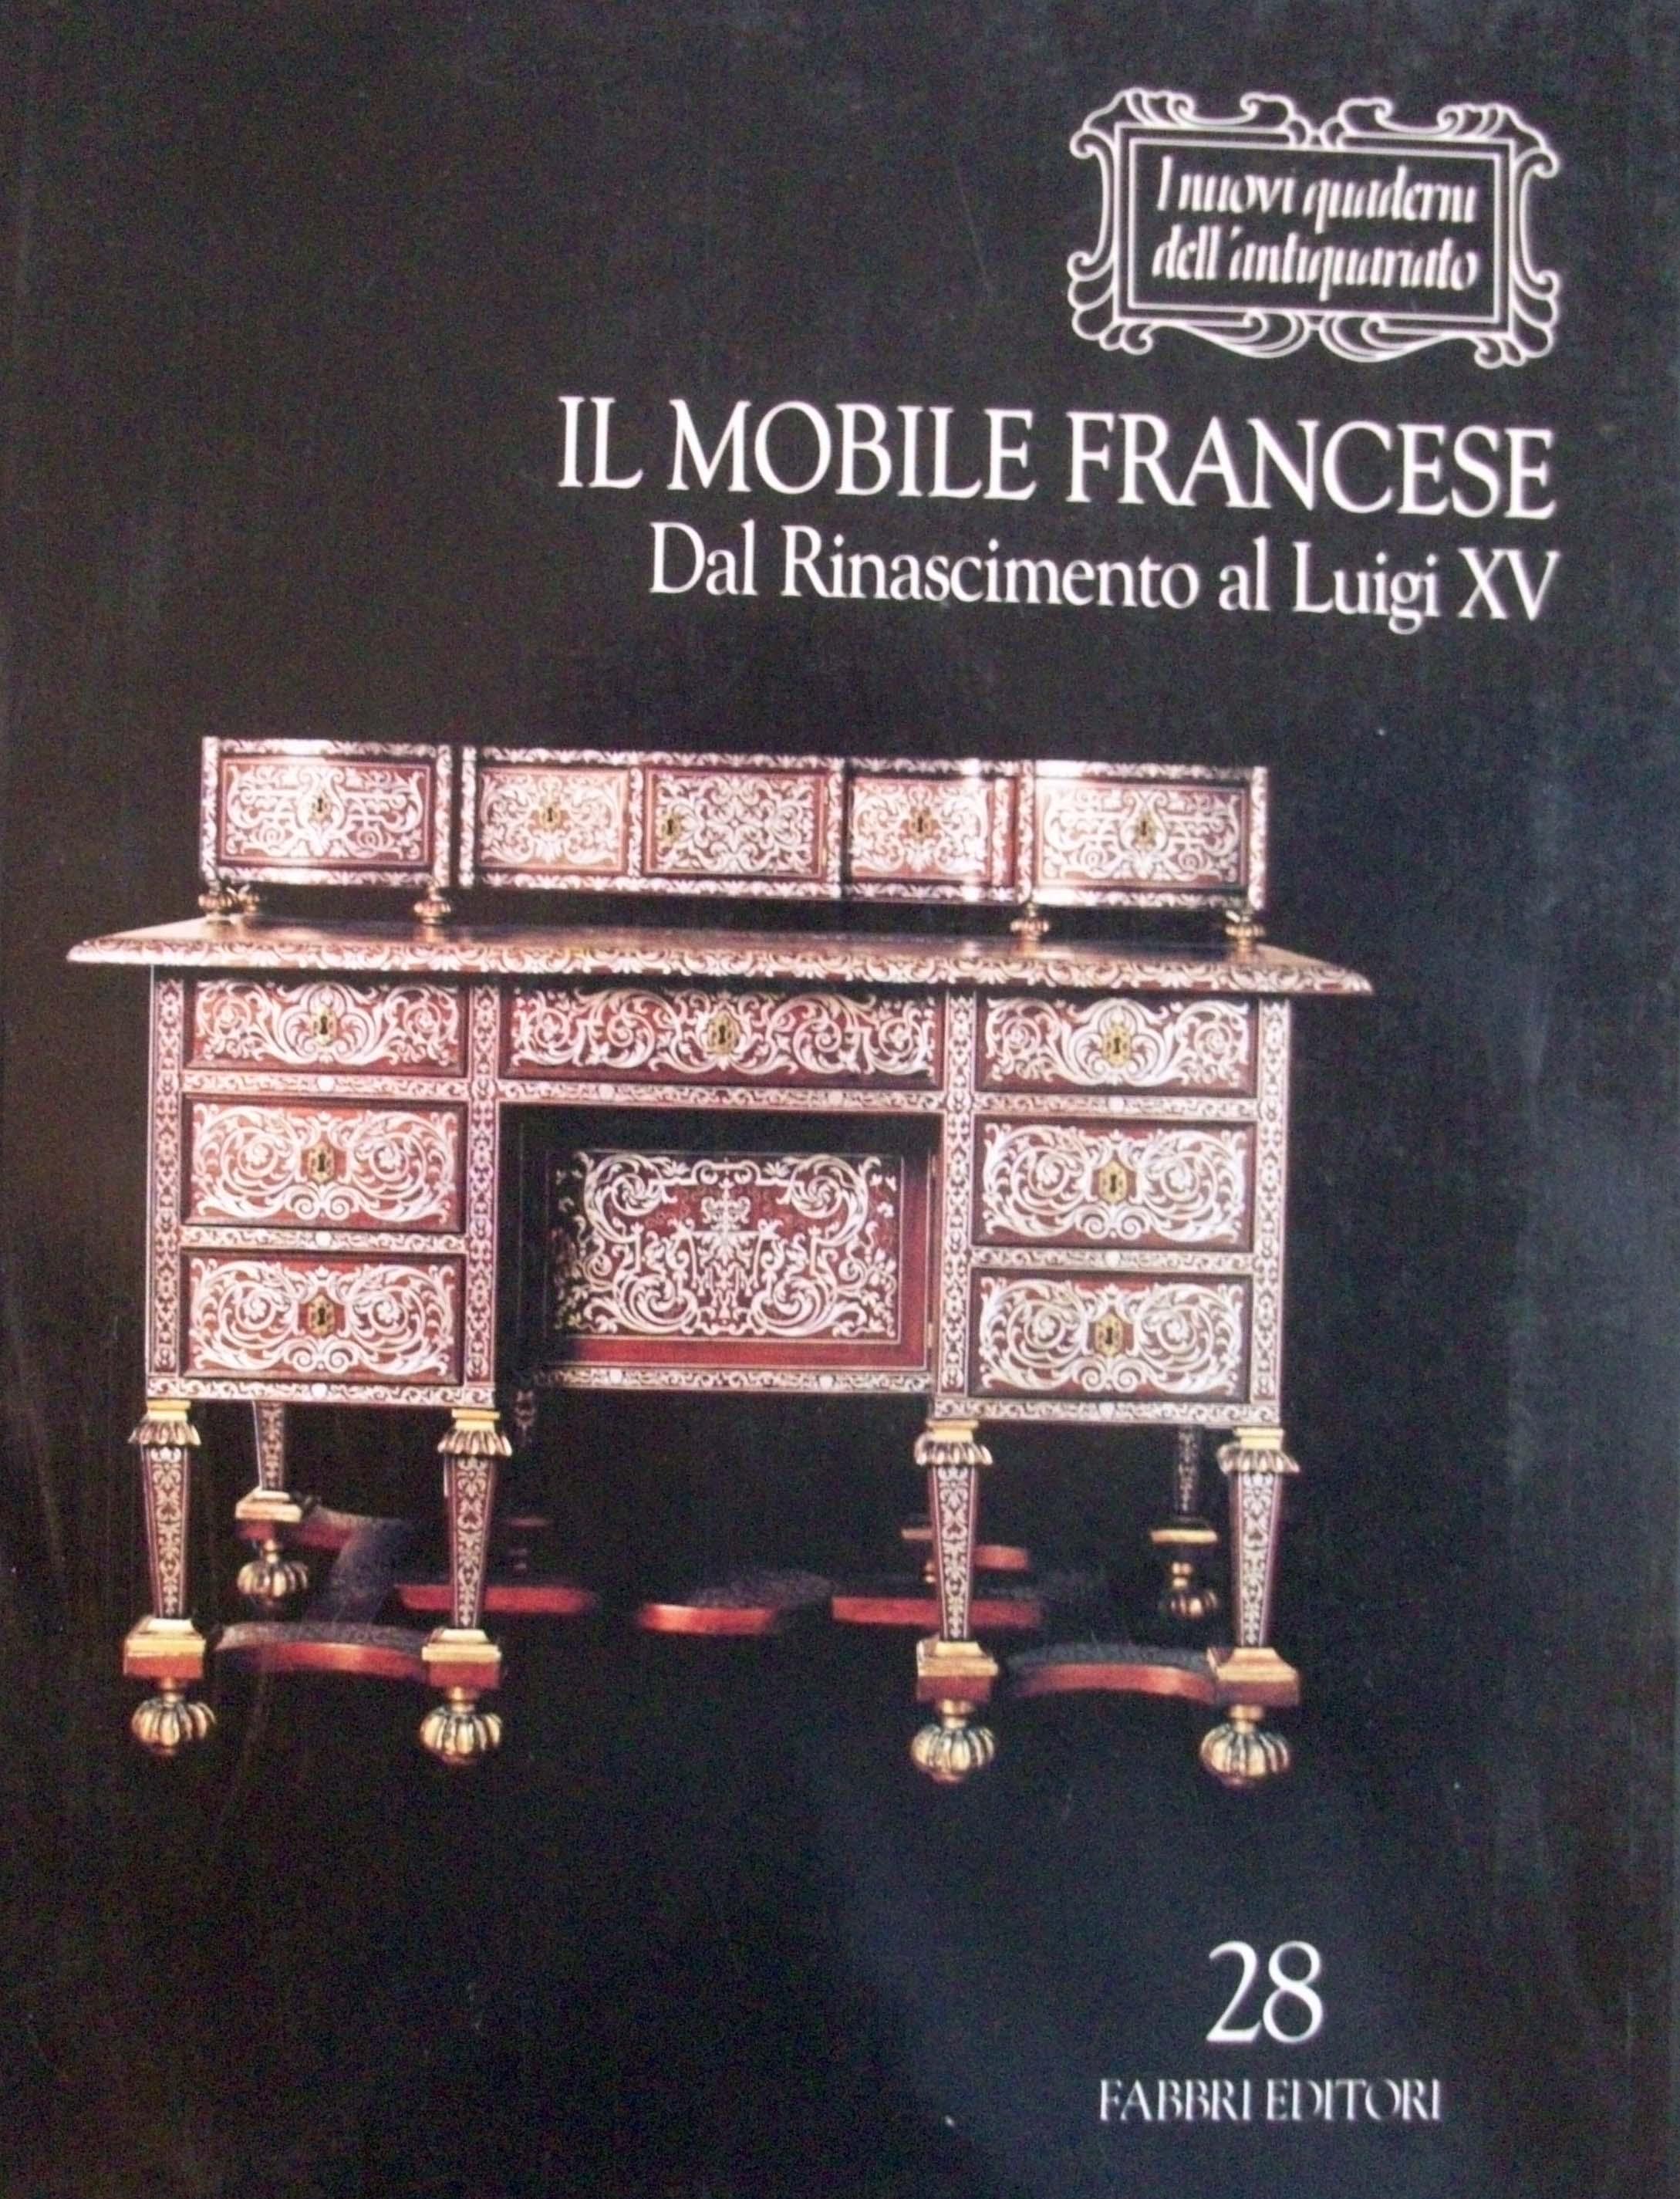 Il mobile francese: dal rinascimento al Luigi XV